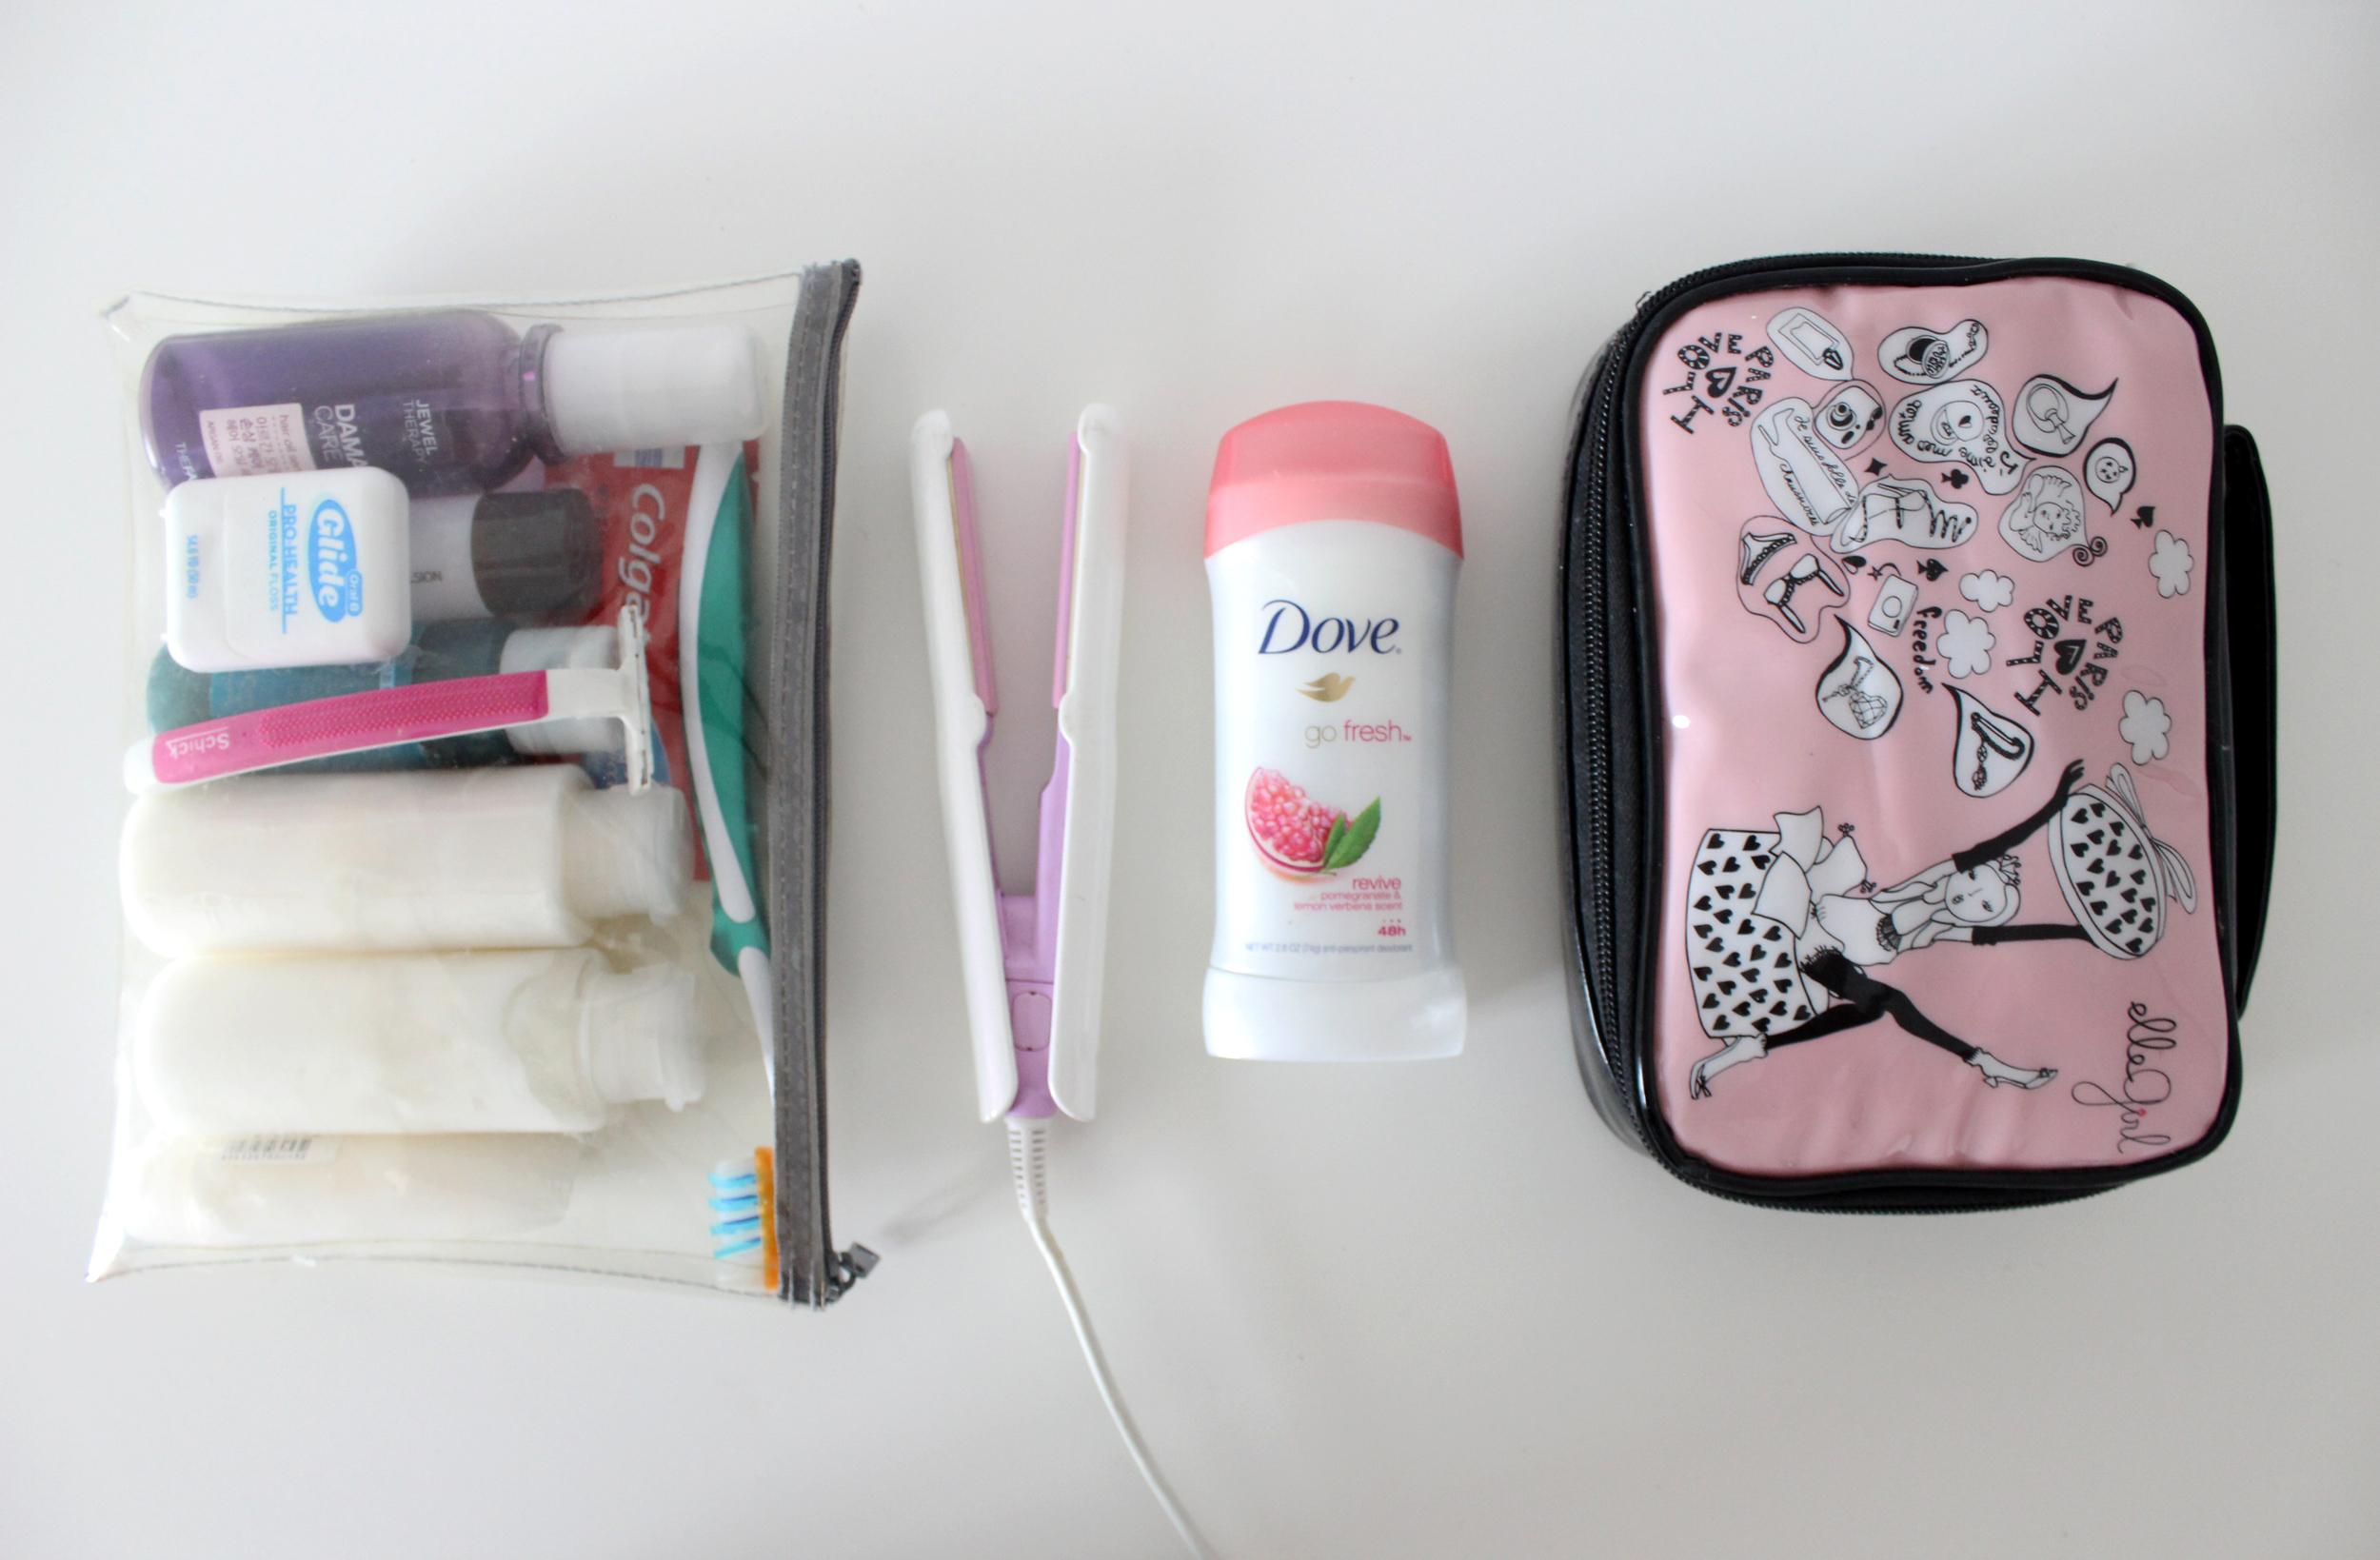 Left to right: 1. My toiletries container ( MUJI ) 2. Mini hair iron ( bought in Korea,  Stylerush  ;alternative  here ) 3. Deodorant ( Dove ) 4. Make-up bag ( Aritaum , bought in Korea)